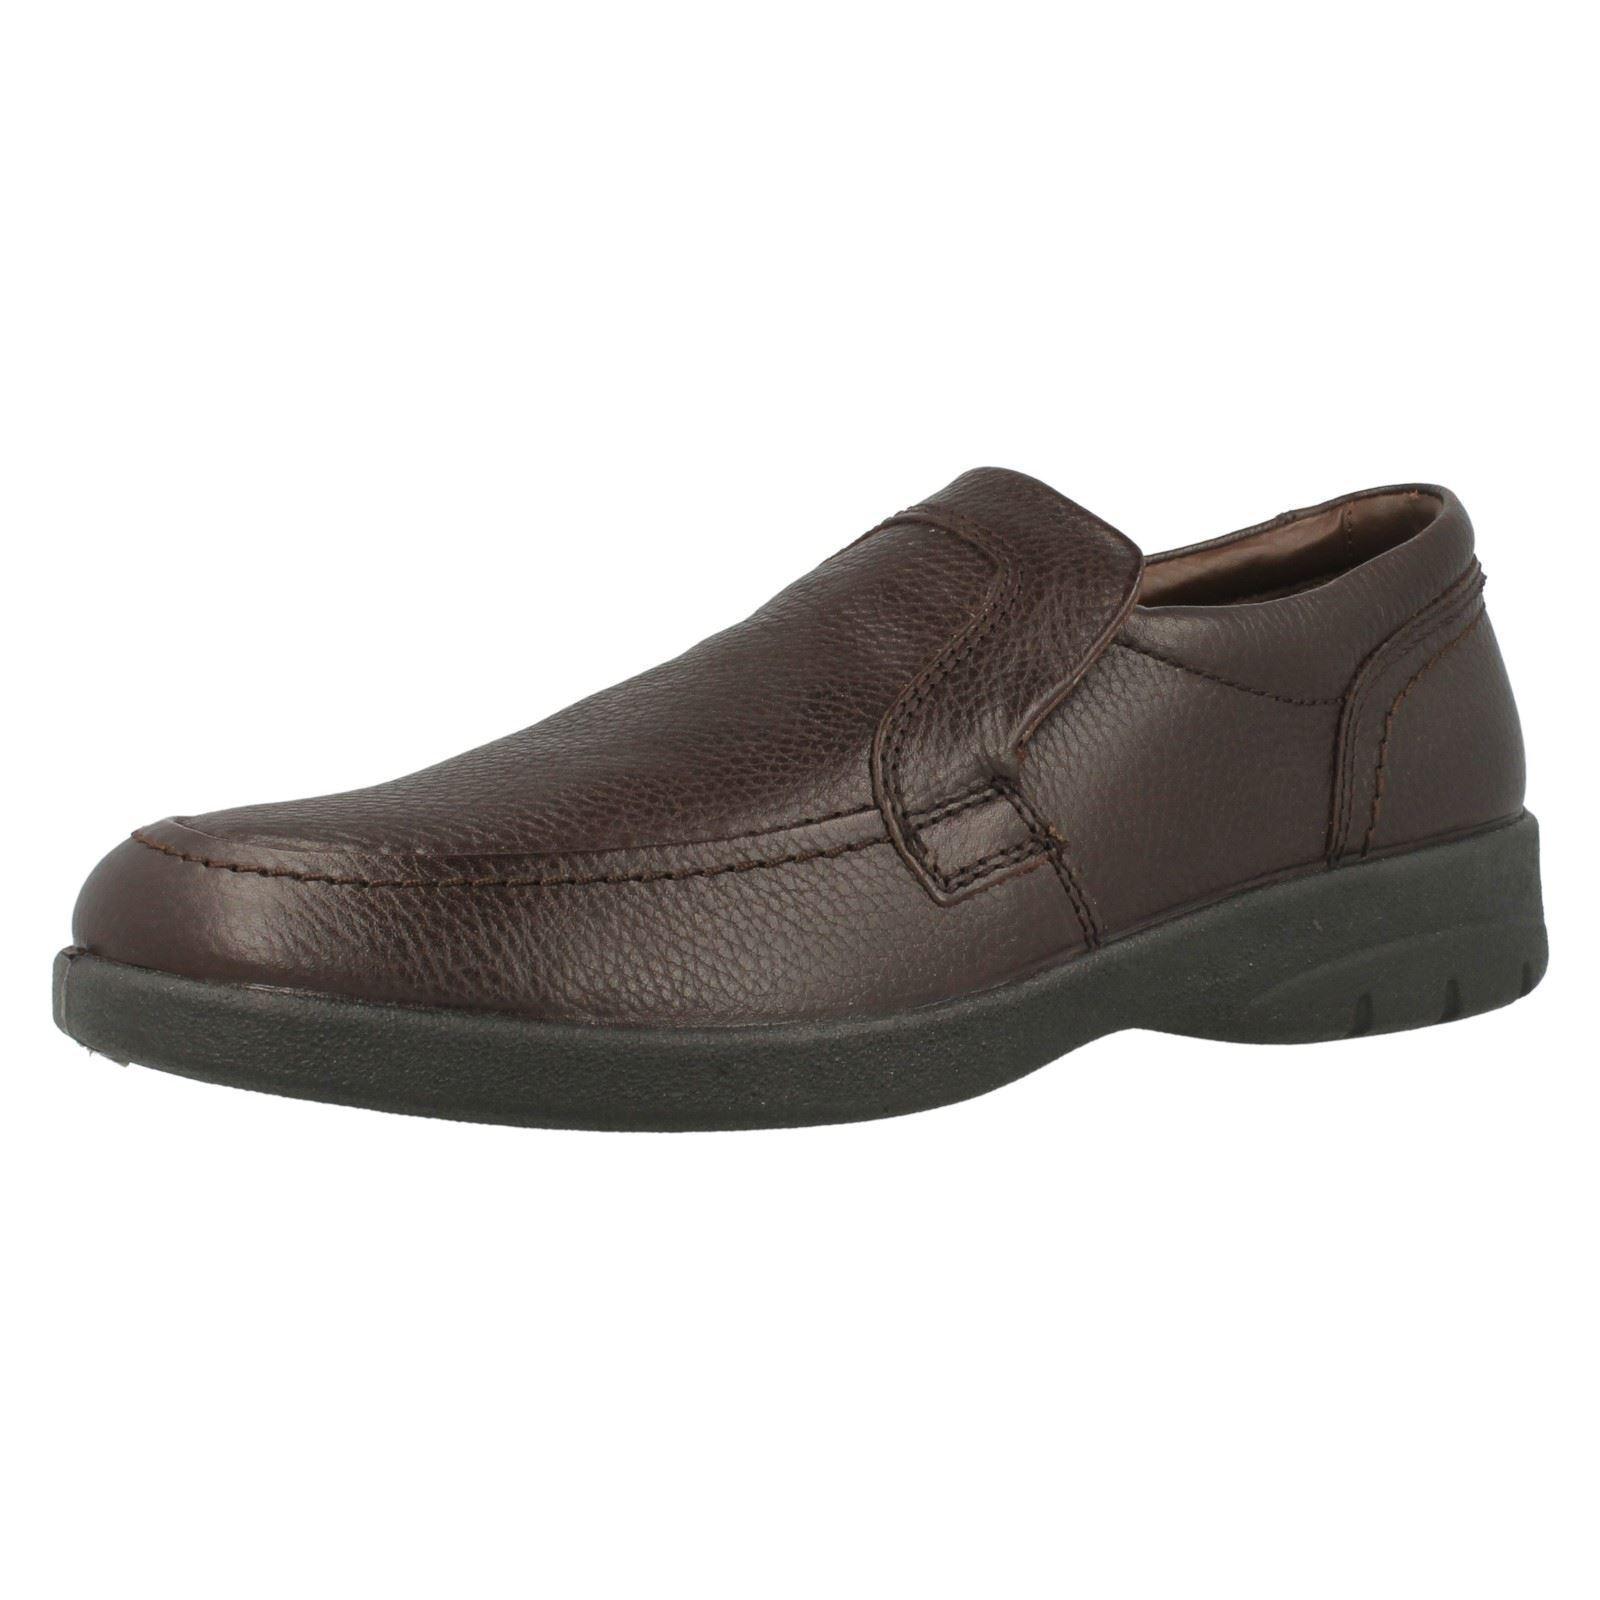 Uomo Braun Slip On Leder Padders Formal Feel Good Feet Dual Fit Schuhes Leo